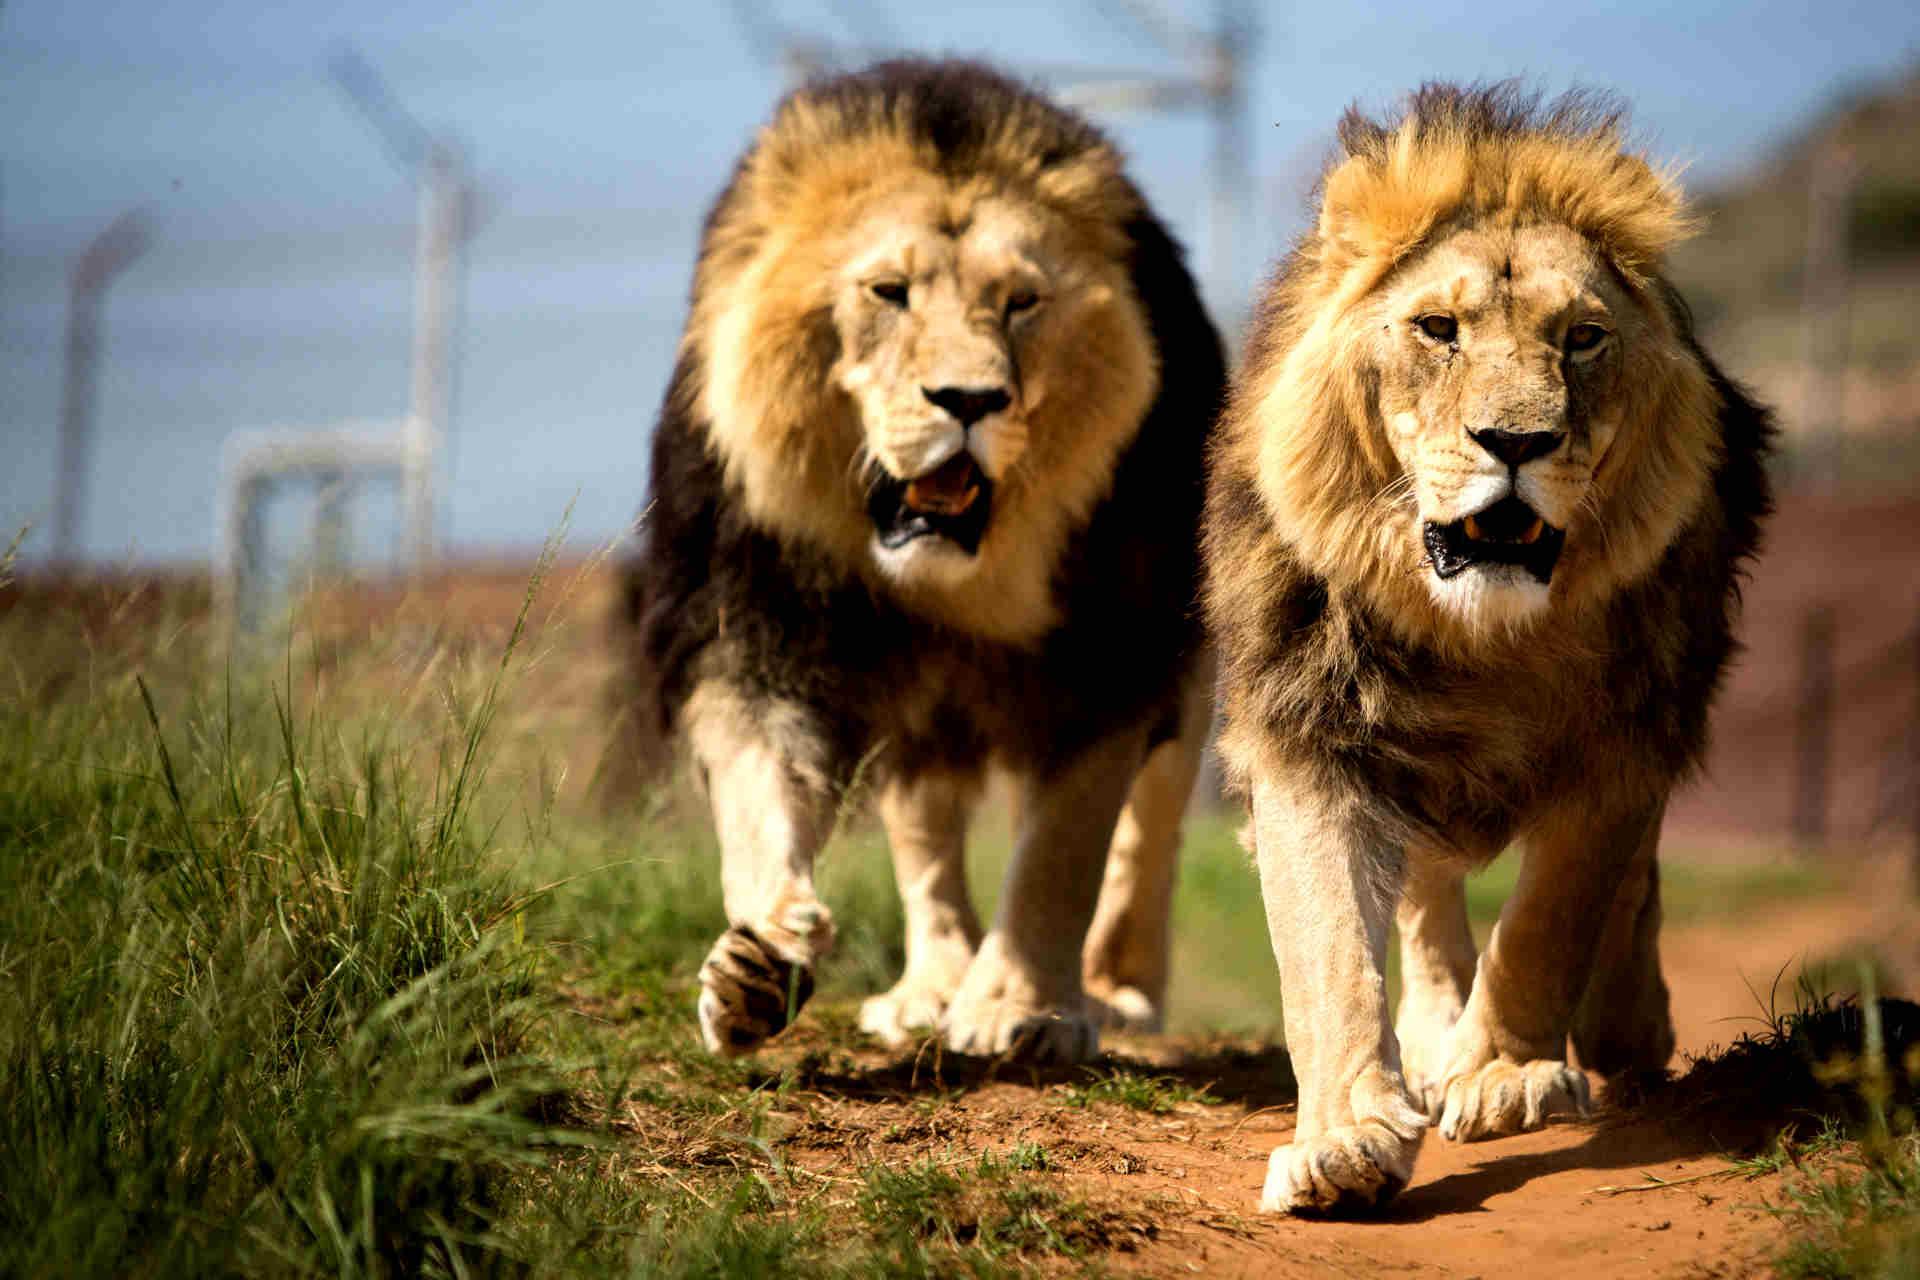 https://www.oysterworldwide.com/panel/wp-content/uploads/2014/04/Prj_South_Africa_prowling_lions-1.jpg